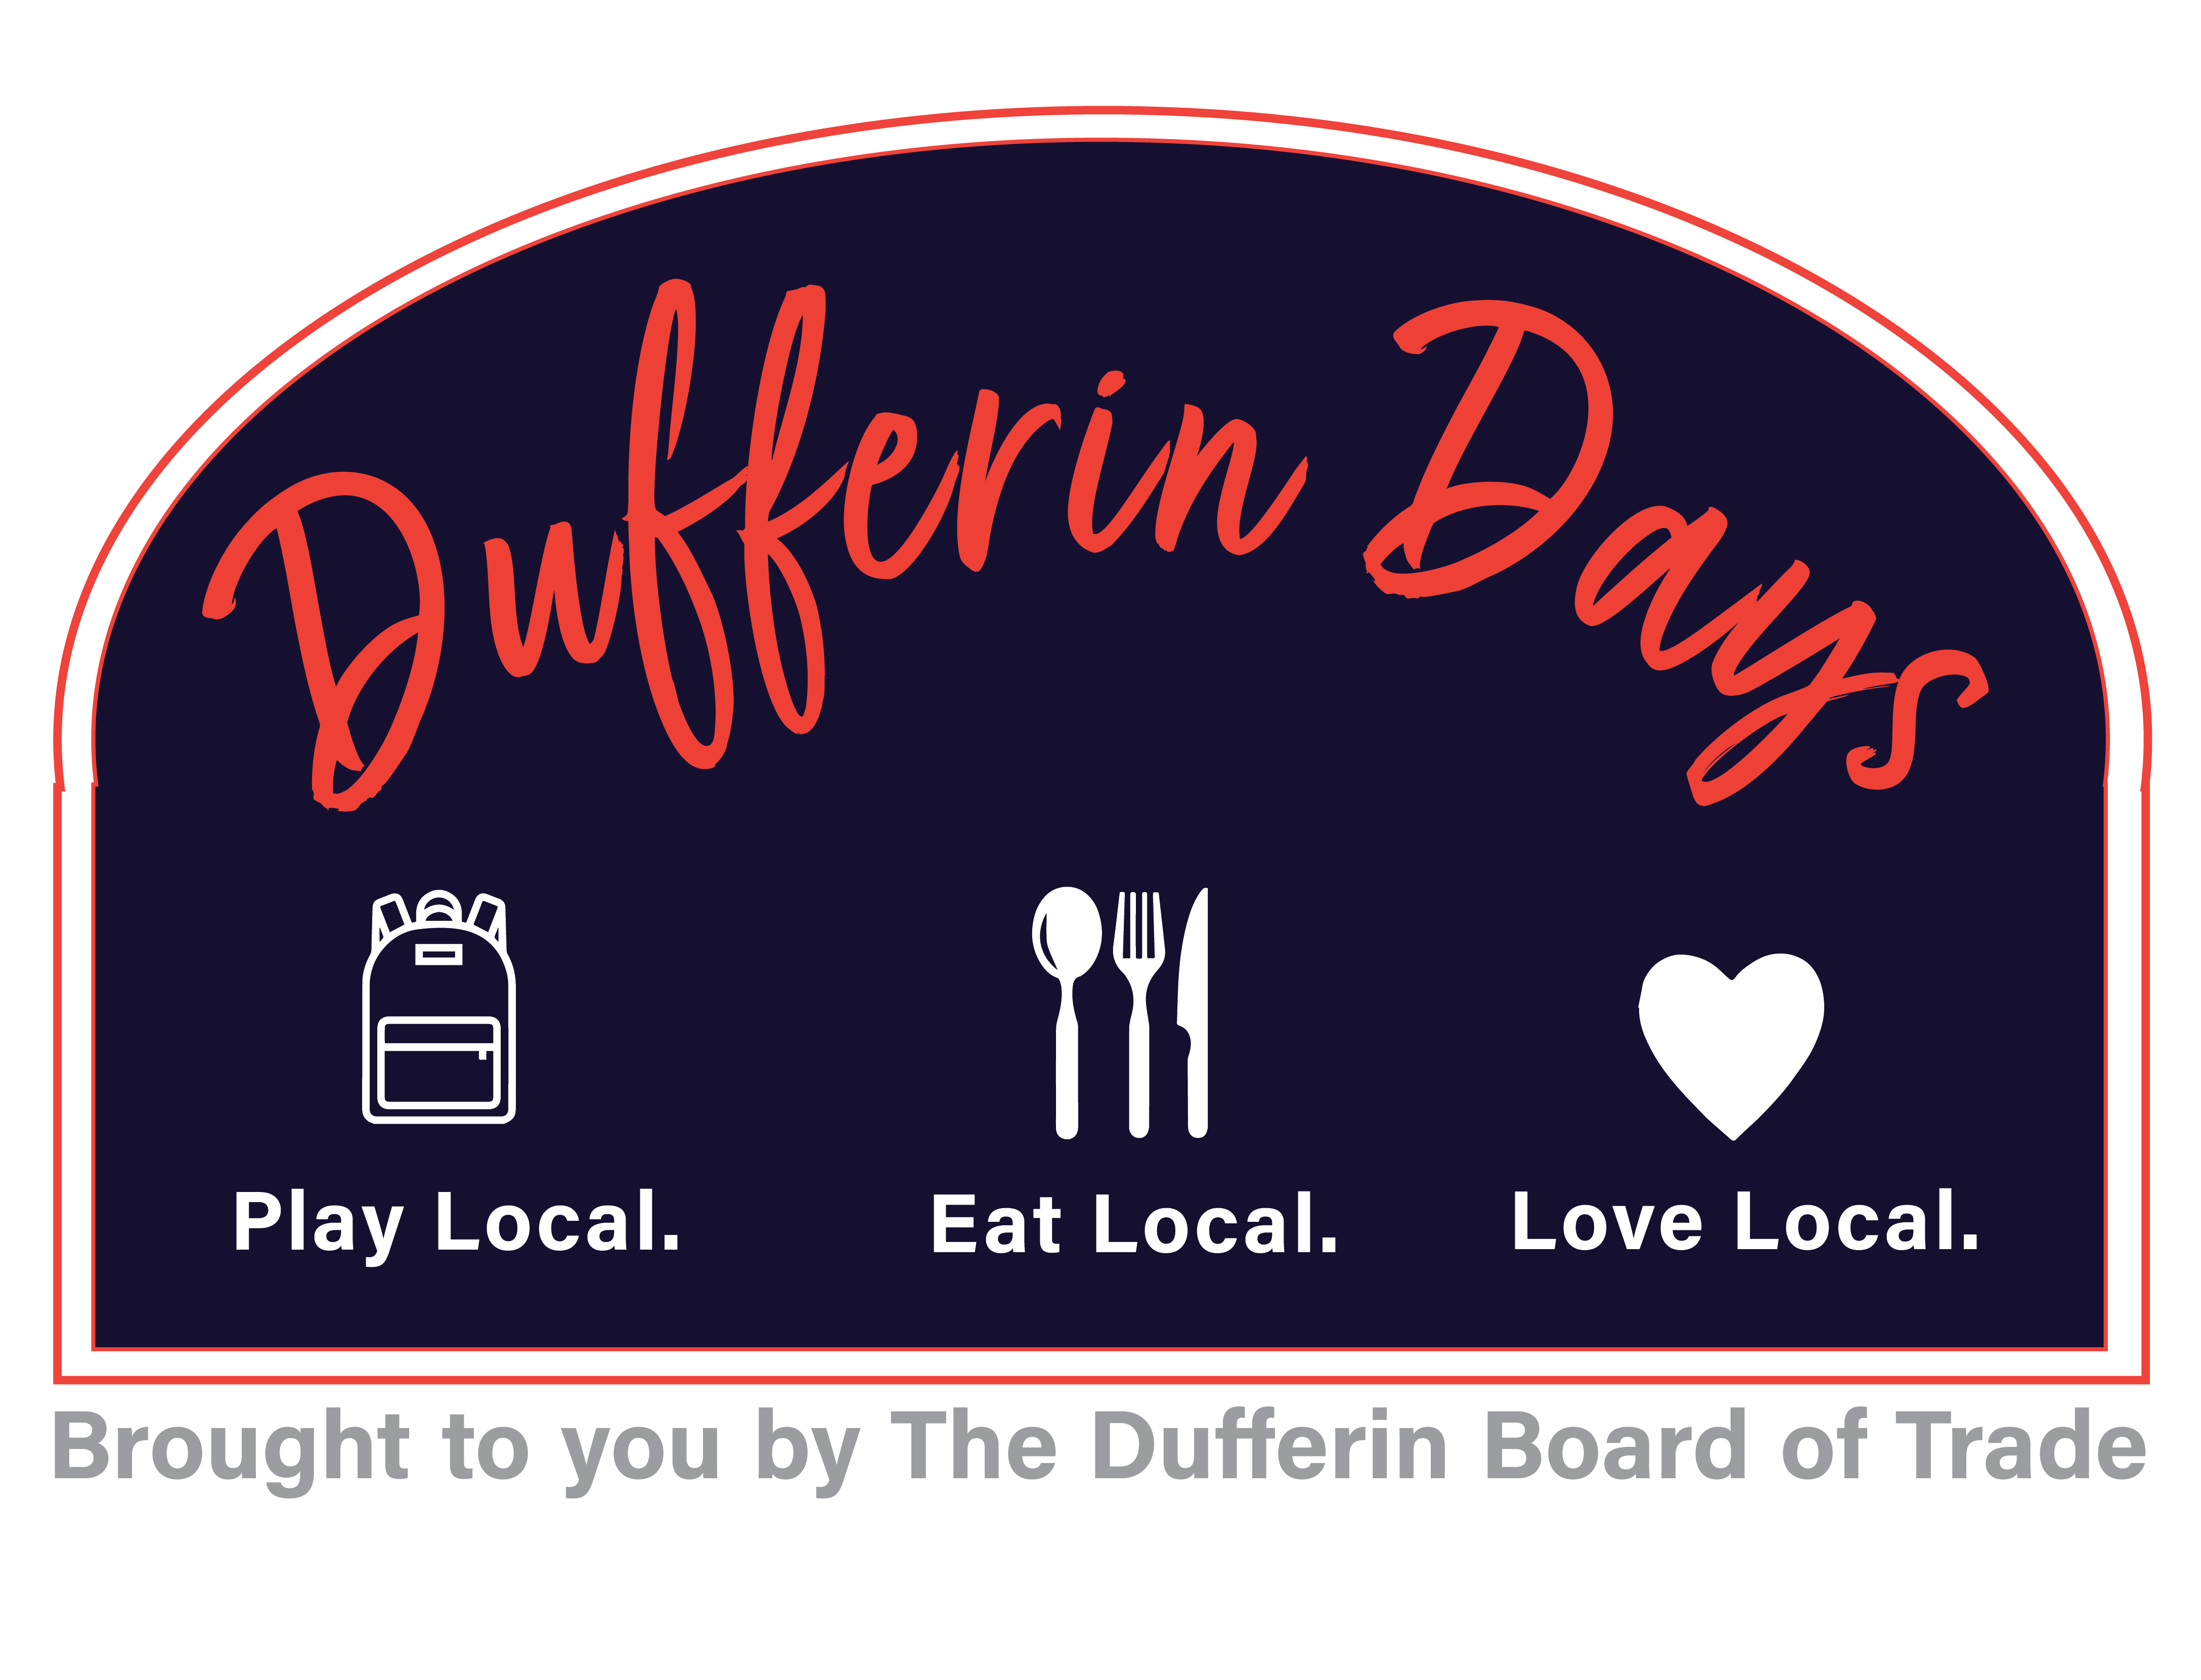 Dufferin Days- shop local campaign